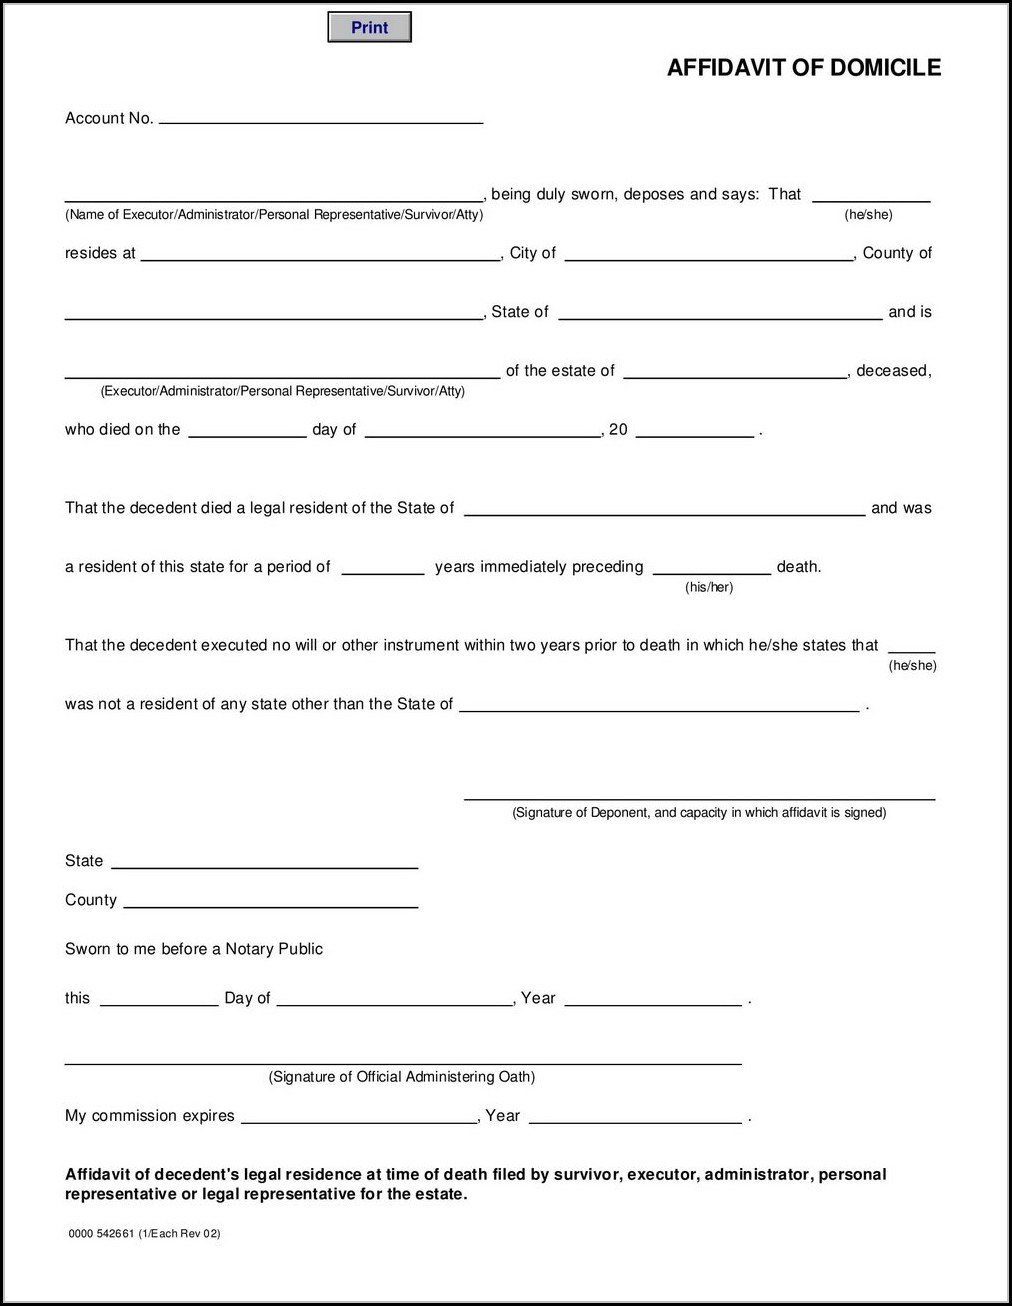 Affidavit Of Domicile Form Wells Fargo